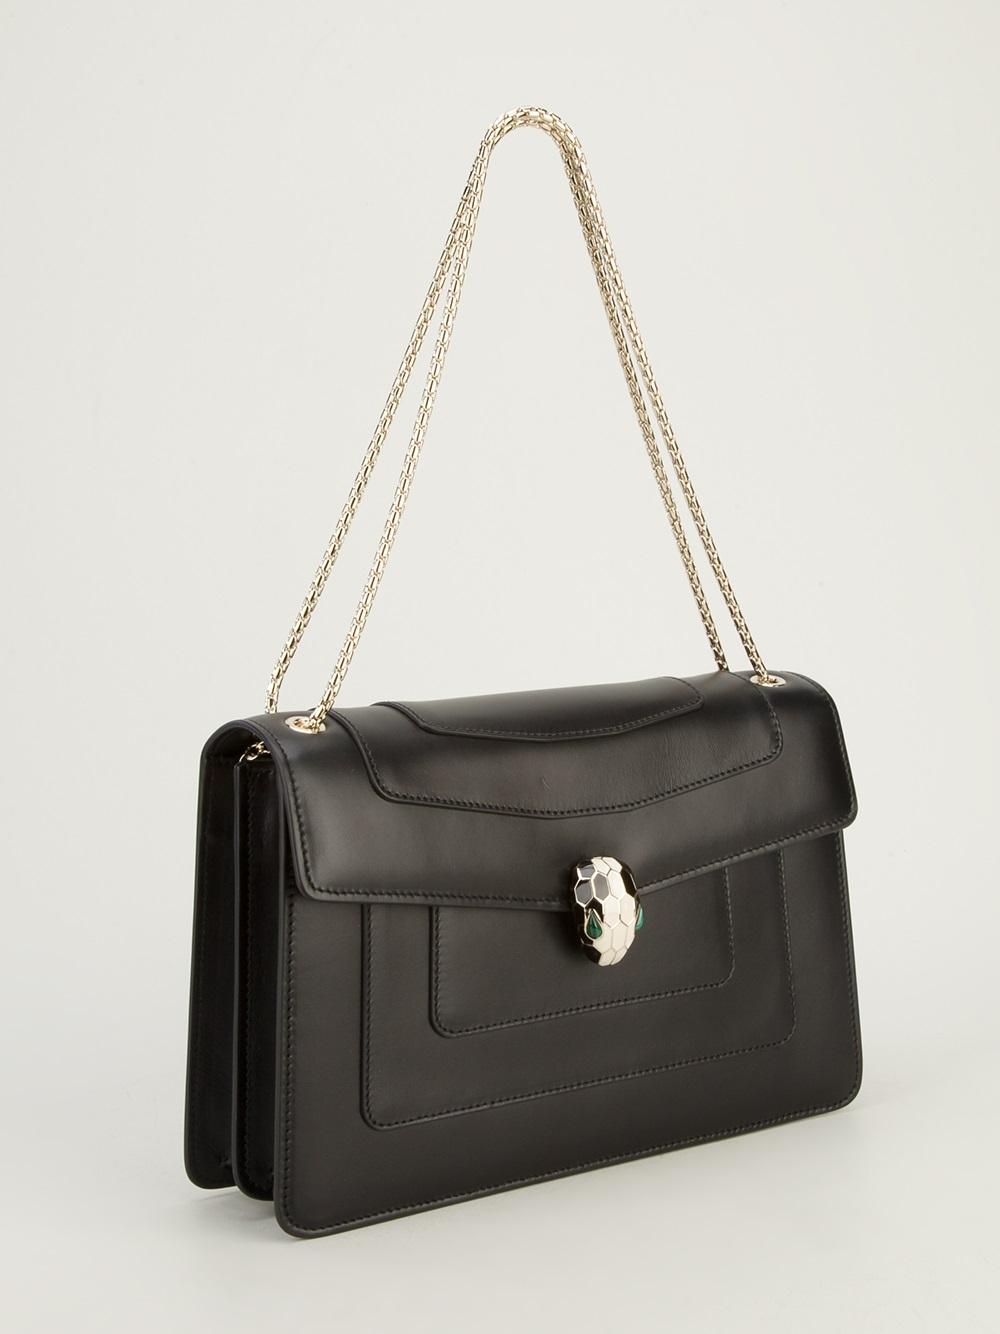 a49f42f7b7ef Lyst - BVLGARI Chain-Strap Leather Shoulder Bag in Black